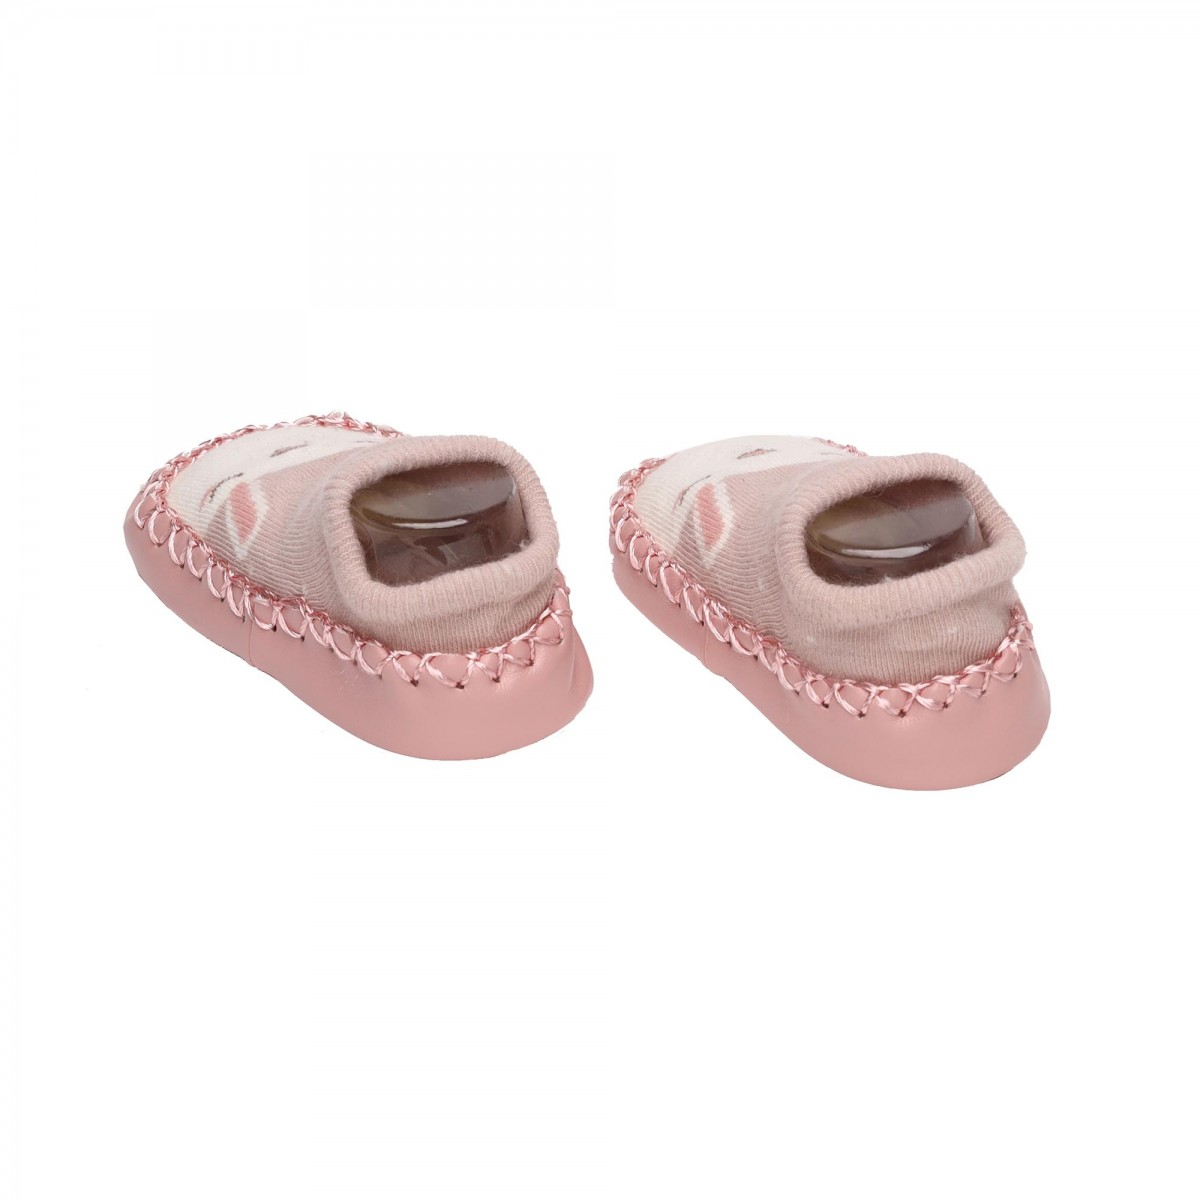 Smiling Shining Pink & Blue Booties - 2 Pack